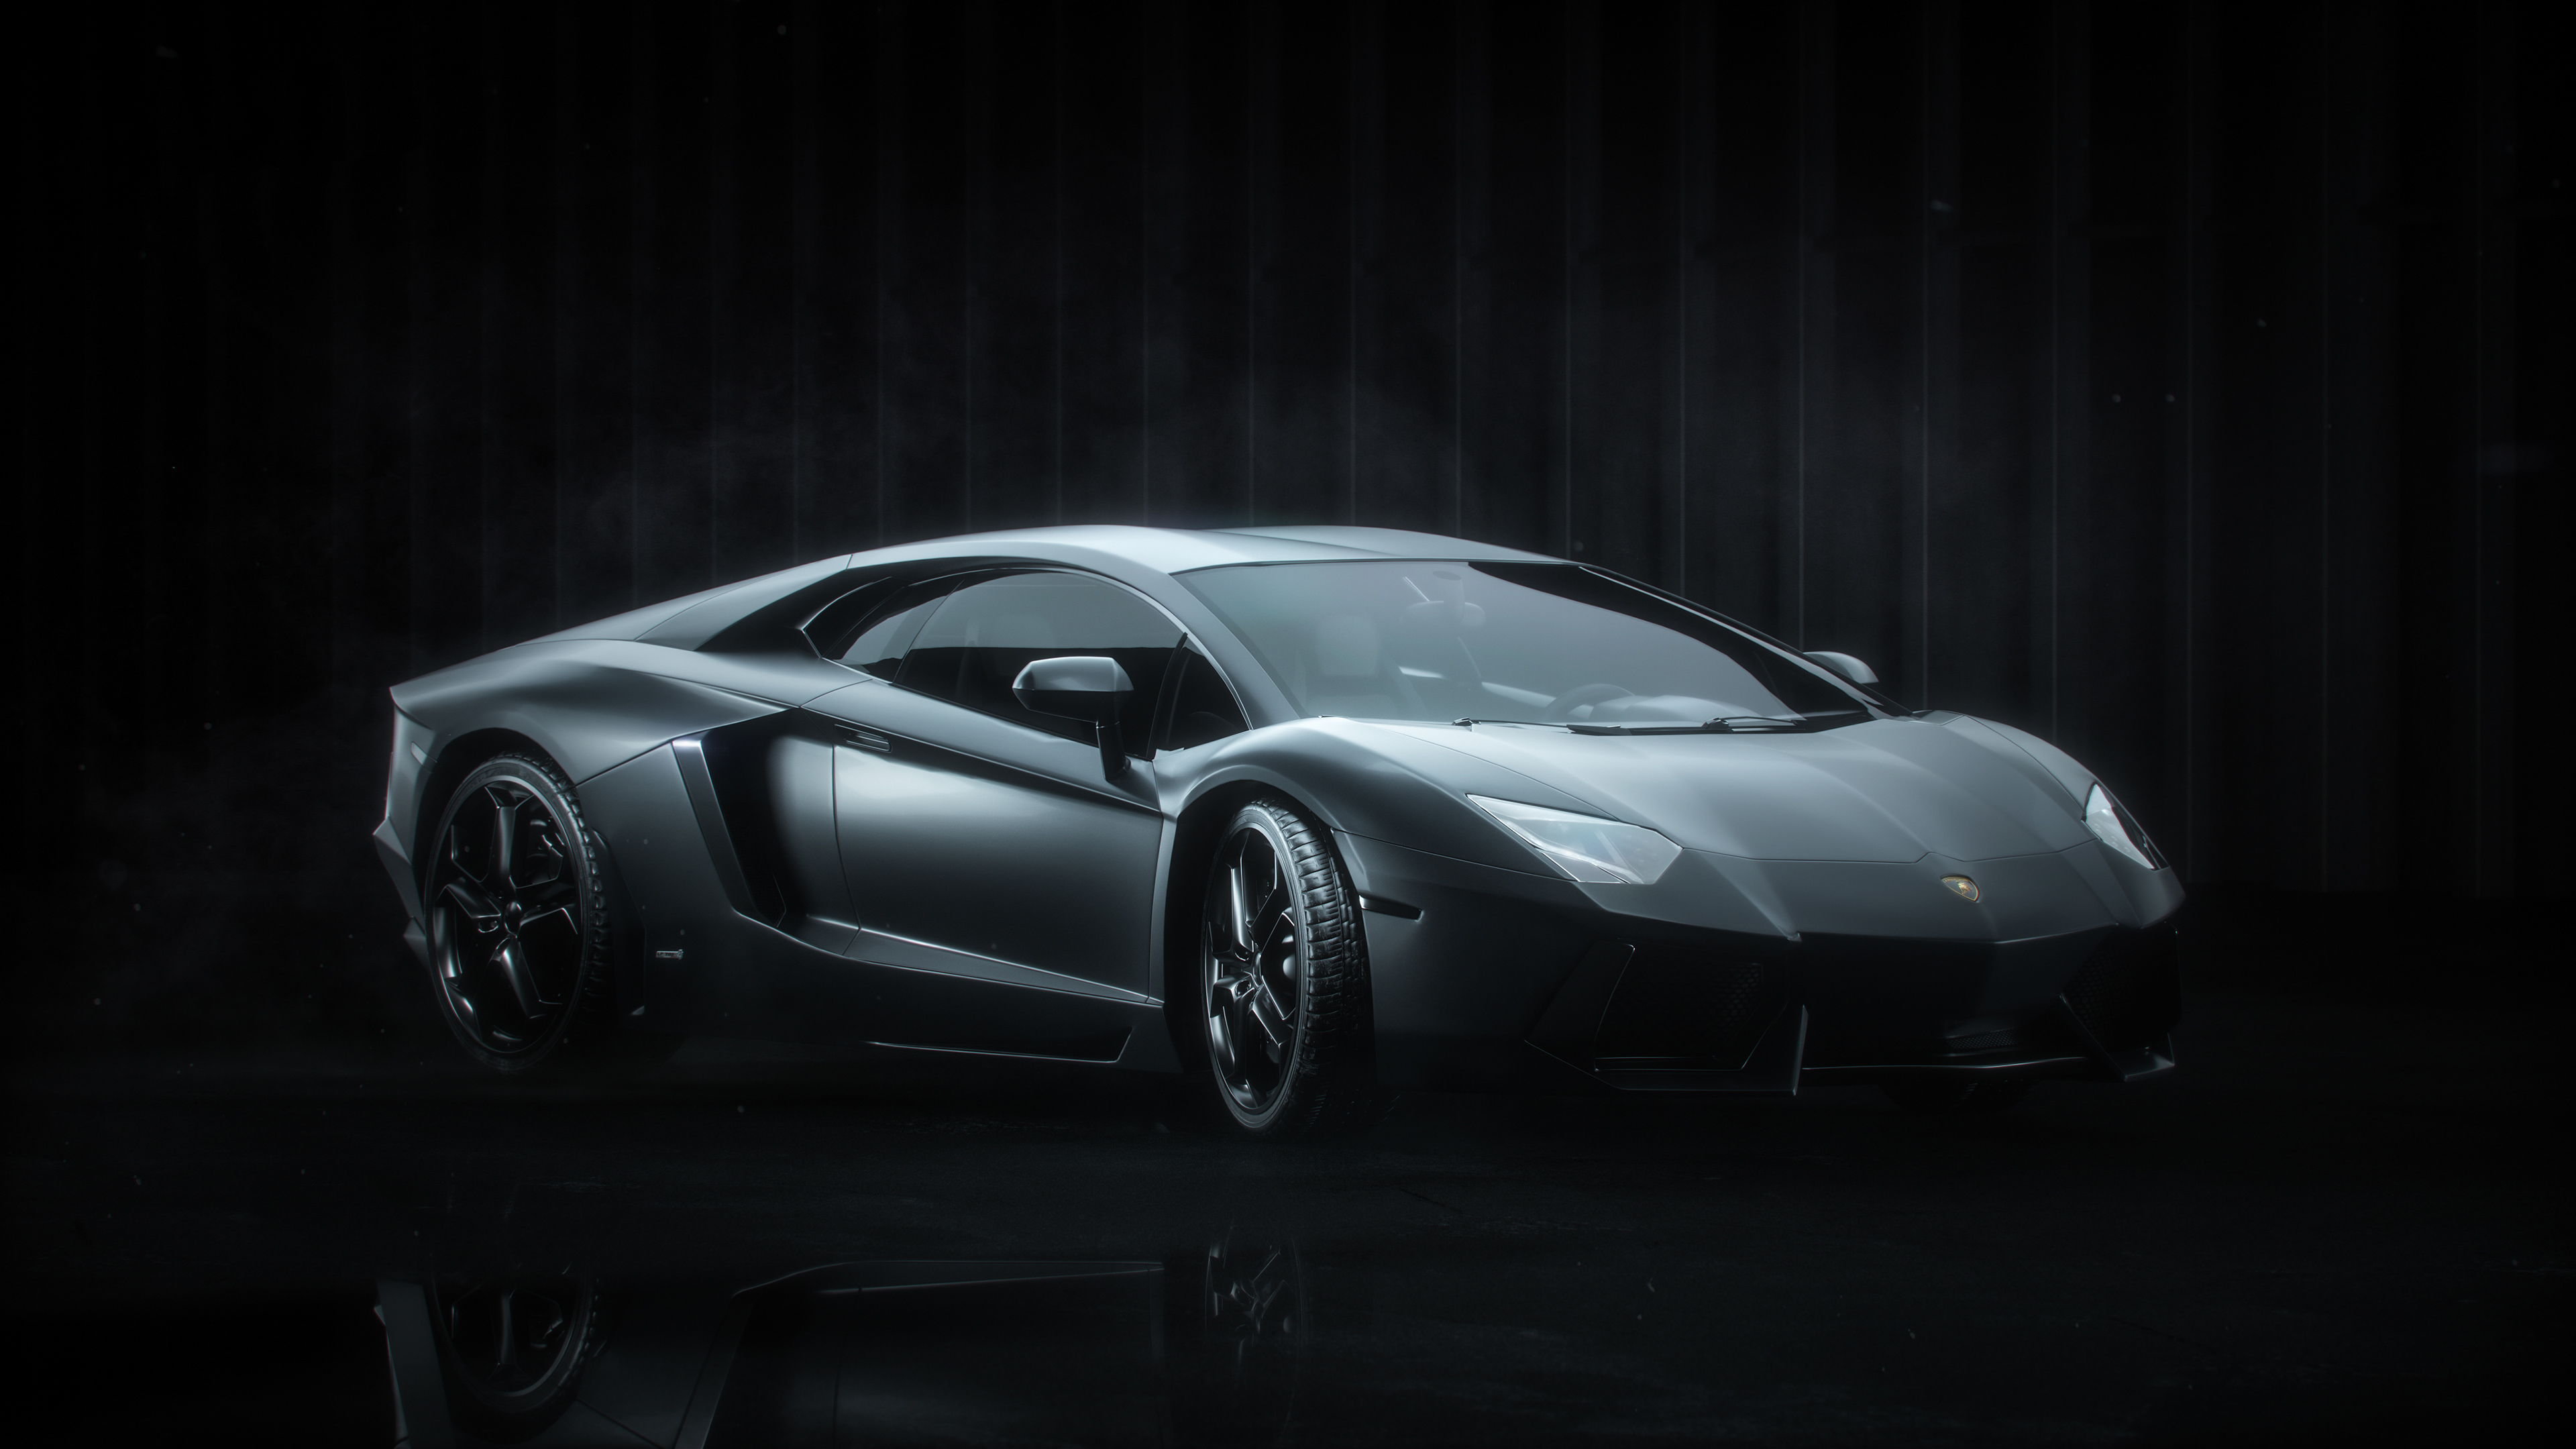 lamborghini cgi front 1541294348 - Lamborghini Cgi Front - lamborghini wallpapers, hd-wallpapers, cgi wallpapers, cars wallpapers, behance wallpapers, 4k-wallpapers